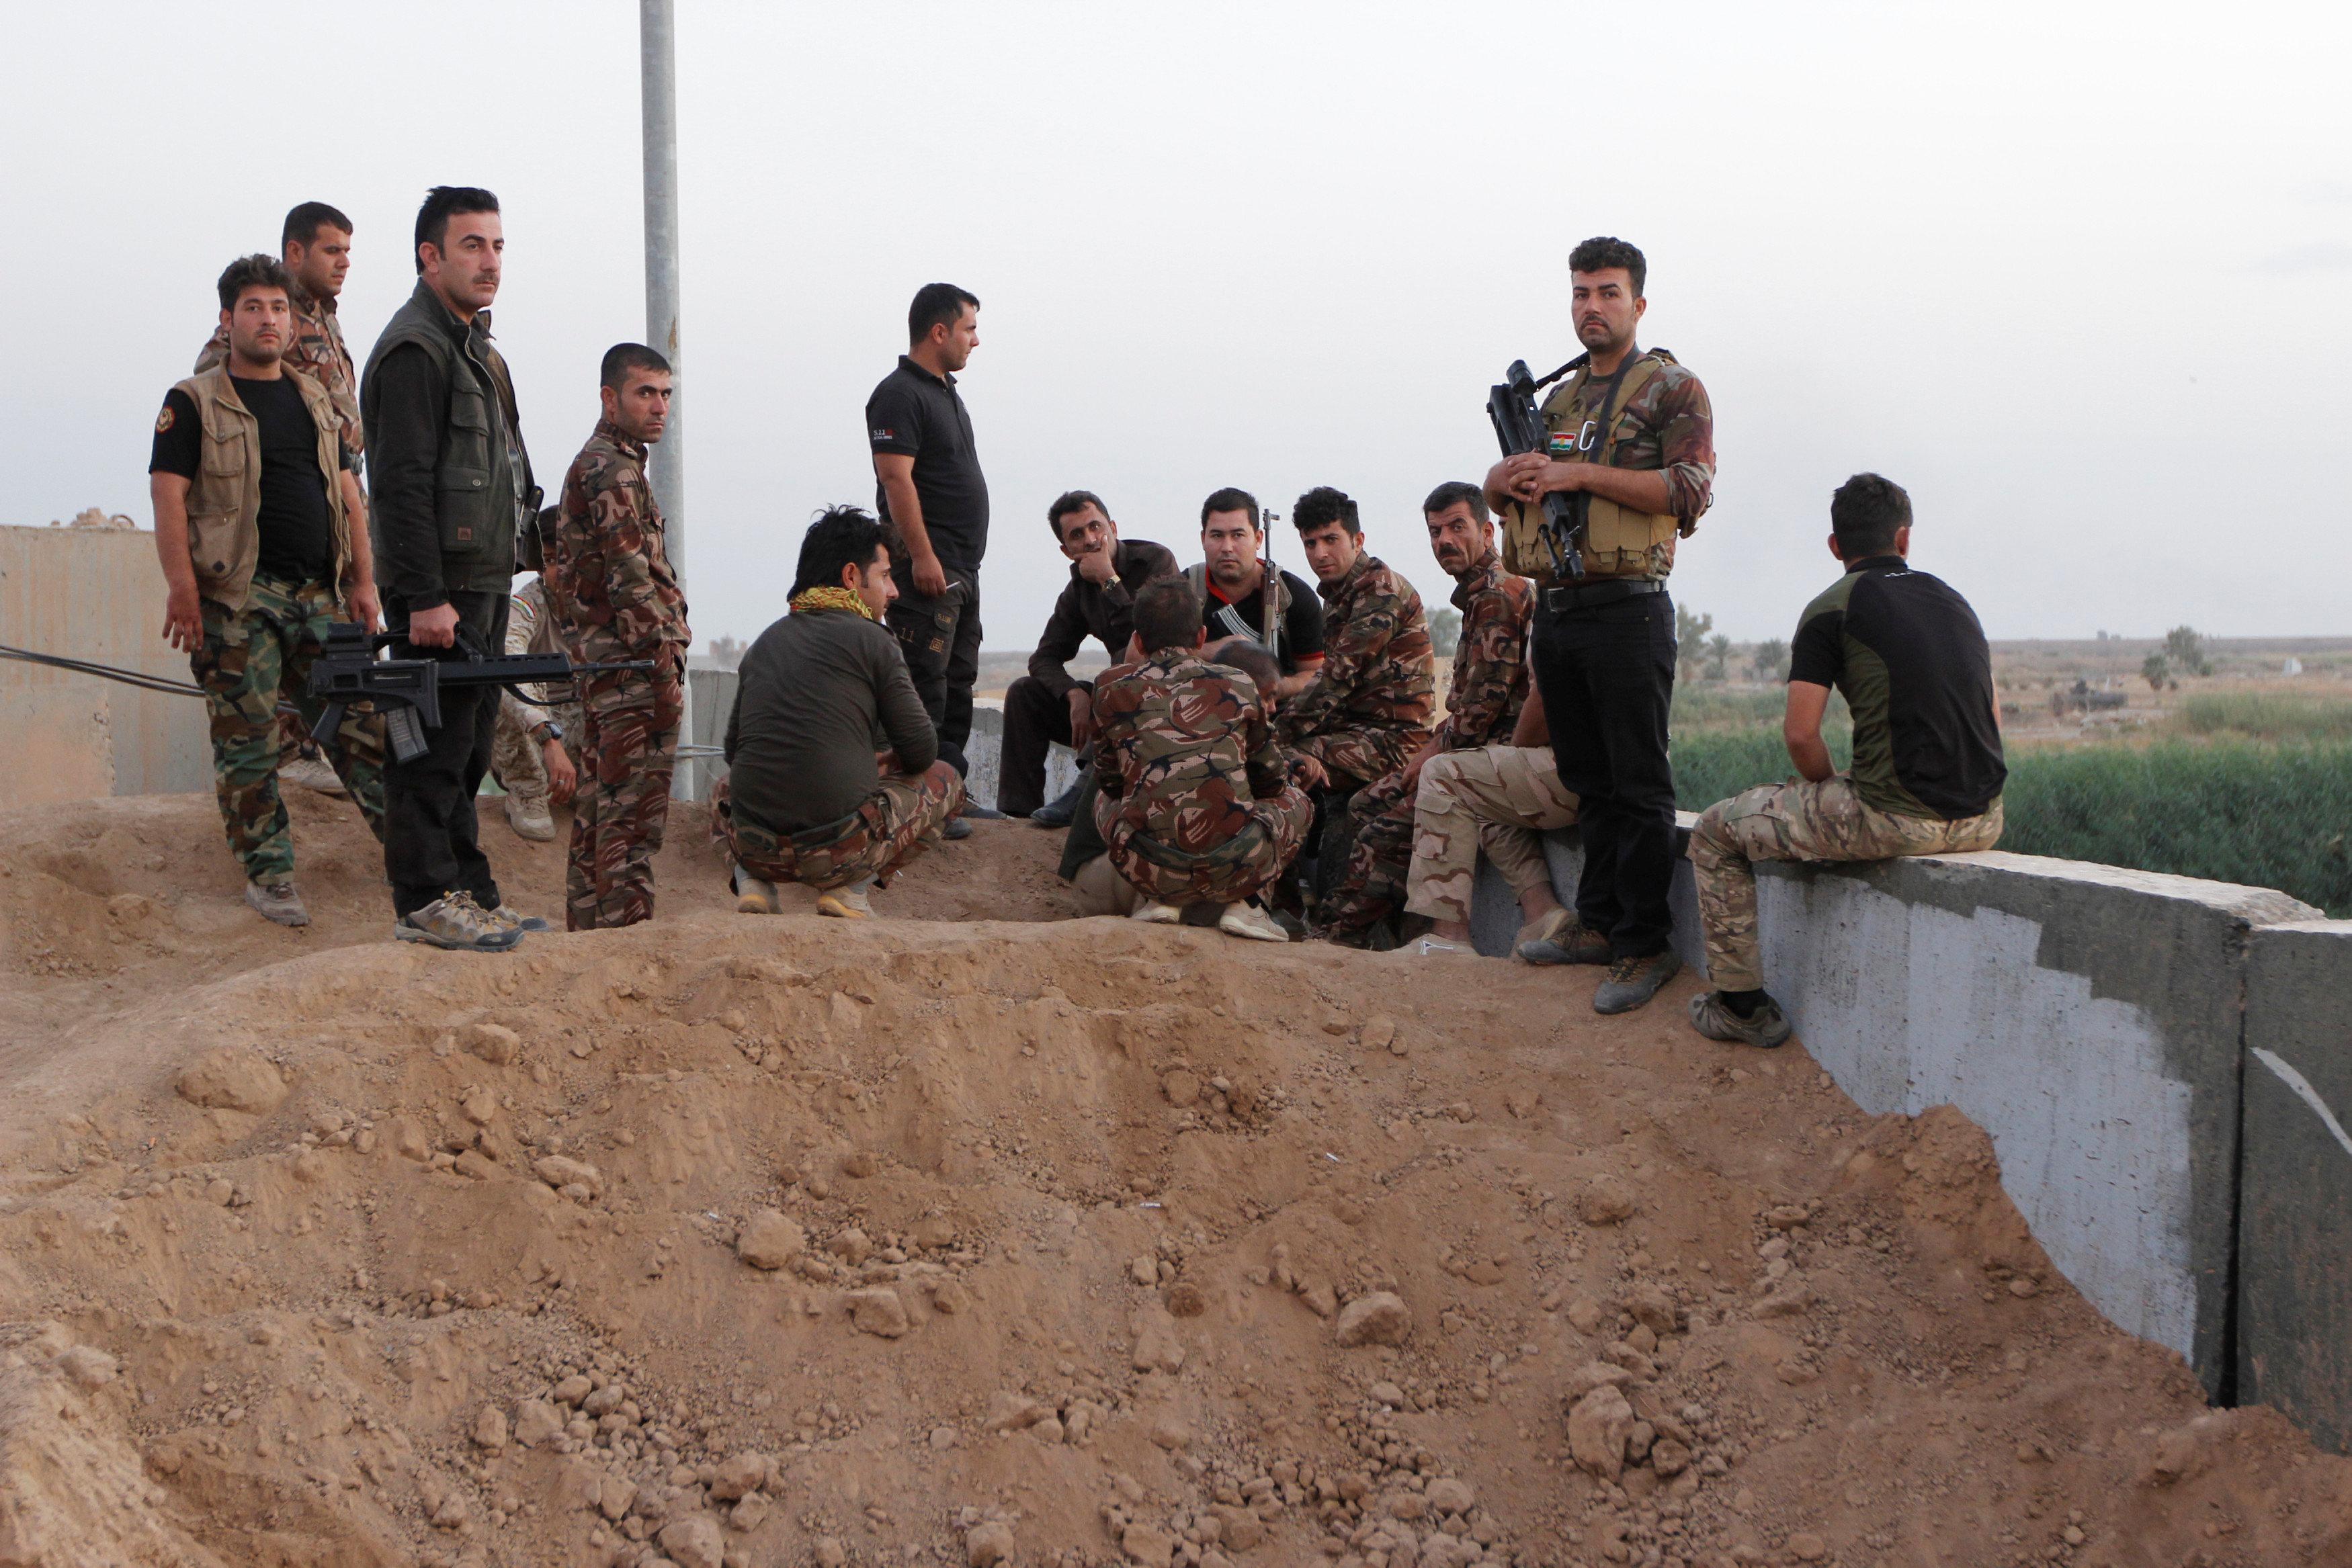 Kurds block Iraqi forces' access to Kirkuk oil fields; Iran shuts border crossings